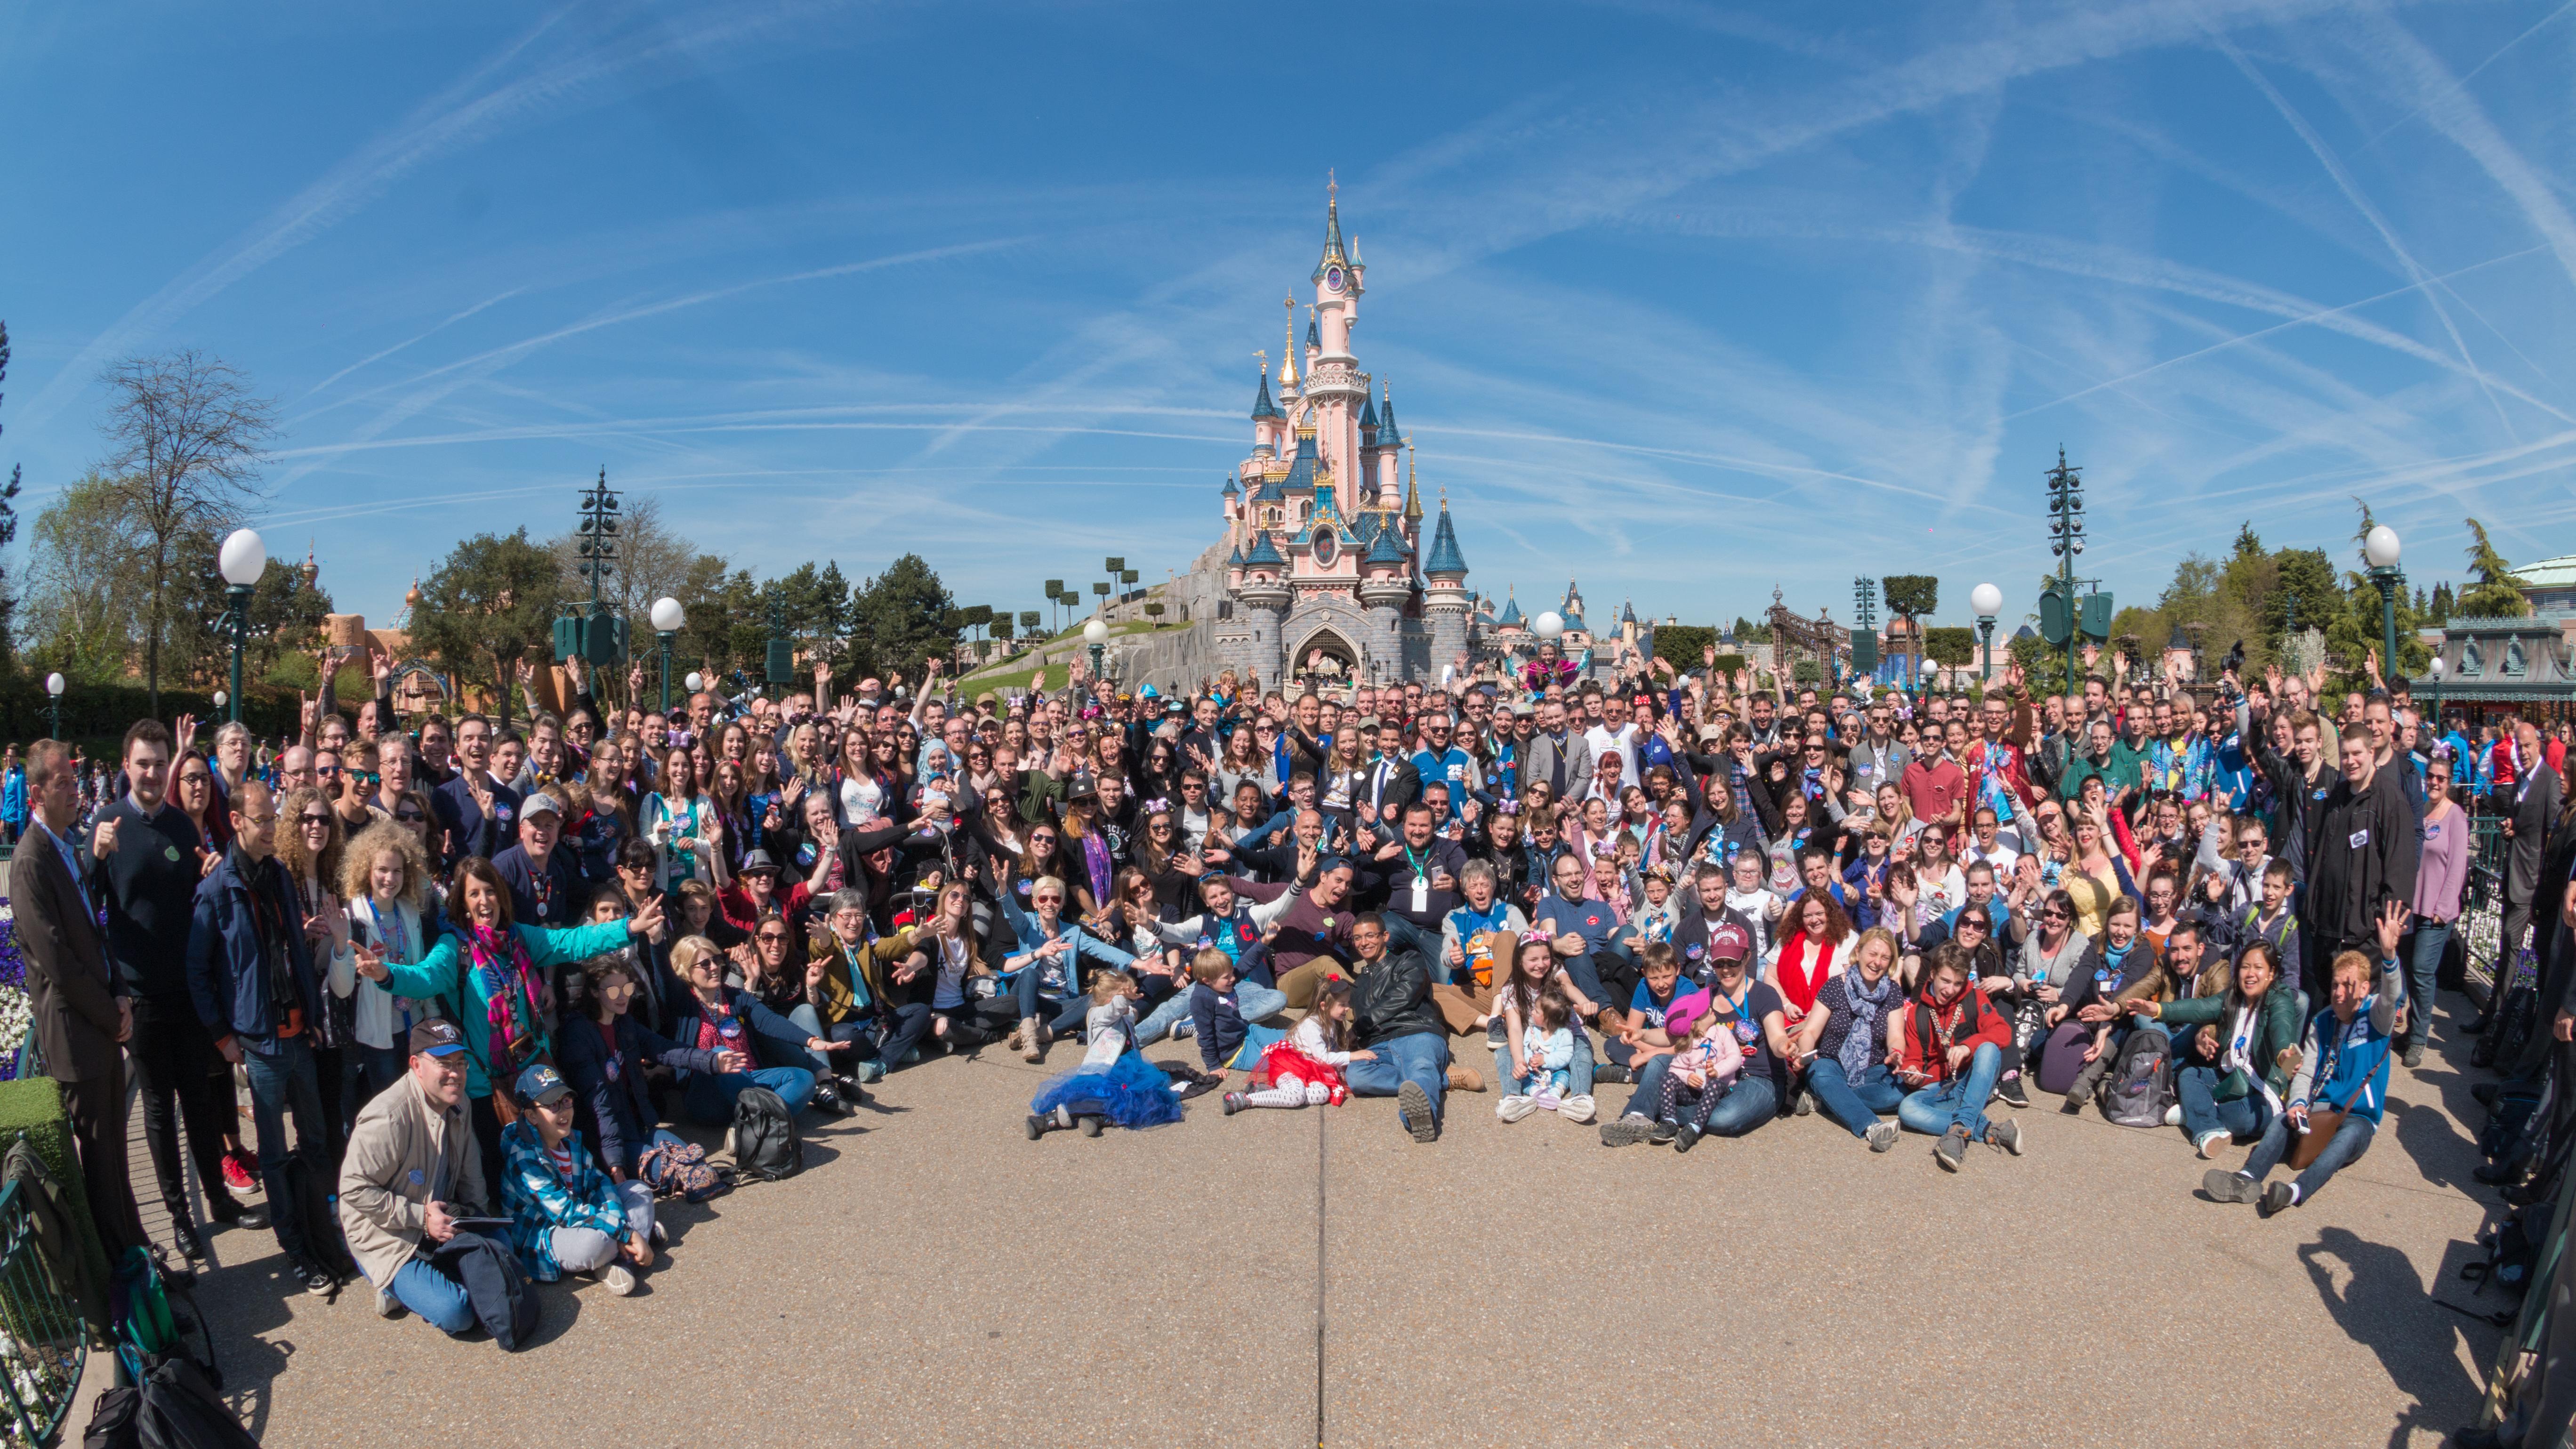 [25 ans] 12 avril 2017 à Disneyland Paris KznNn9